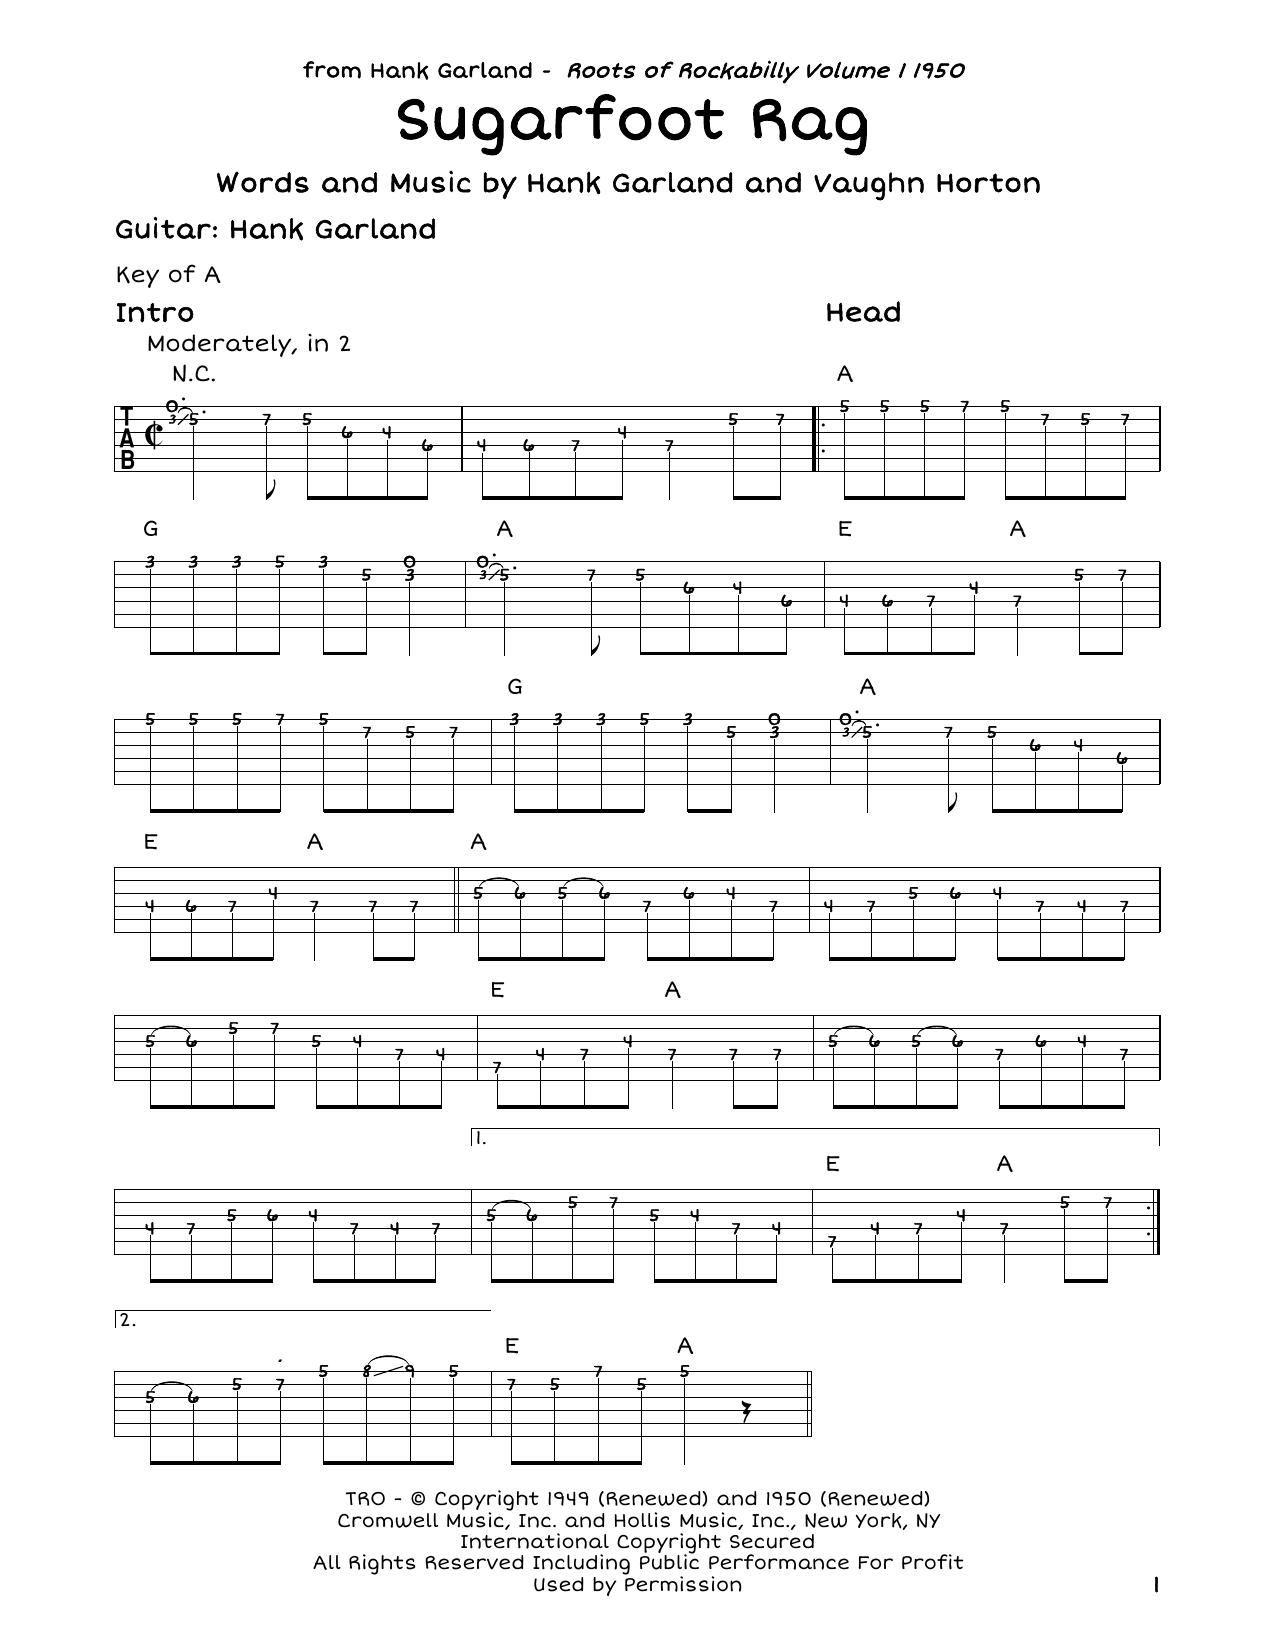 Red Foley Sugarfoot Rag sheet music notes and chords. Download Printable PDF.